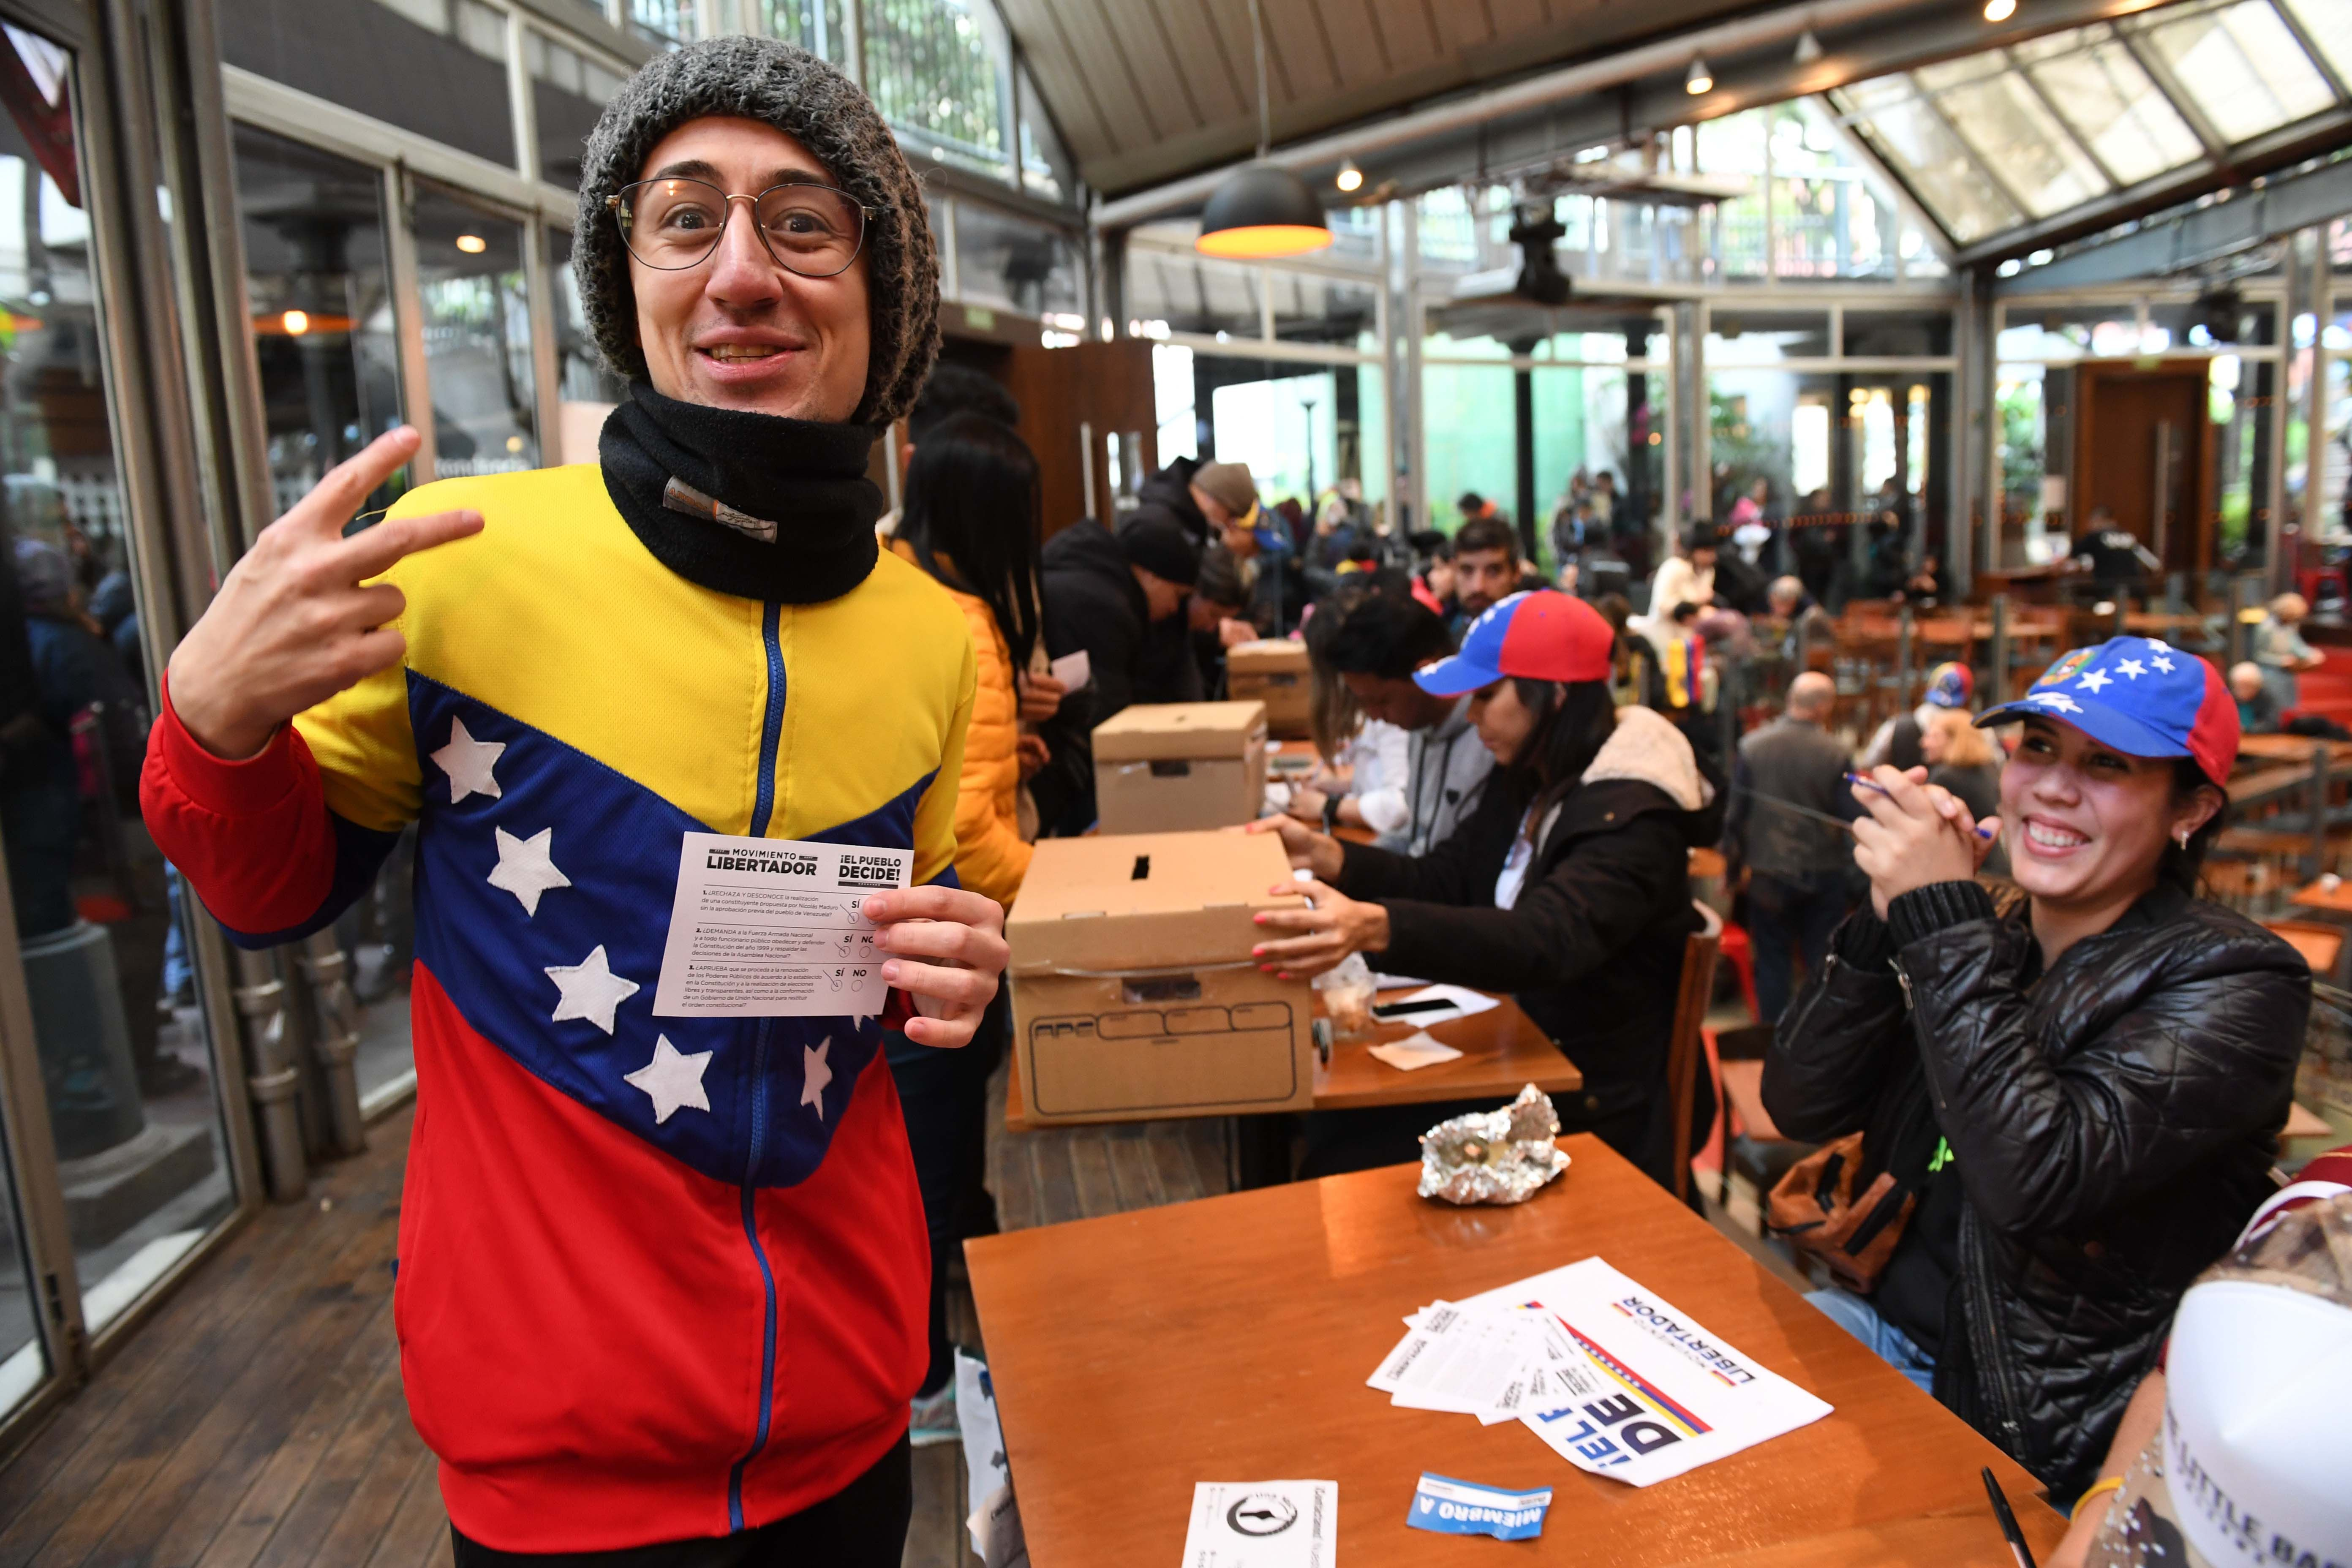 Masiva participación de venezolanos que viven en Argentina contra Maduro